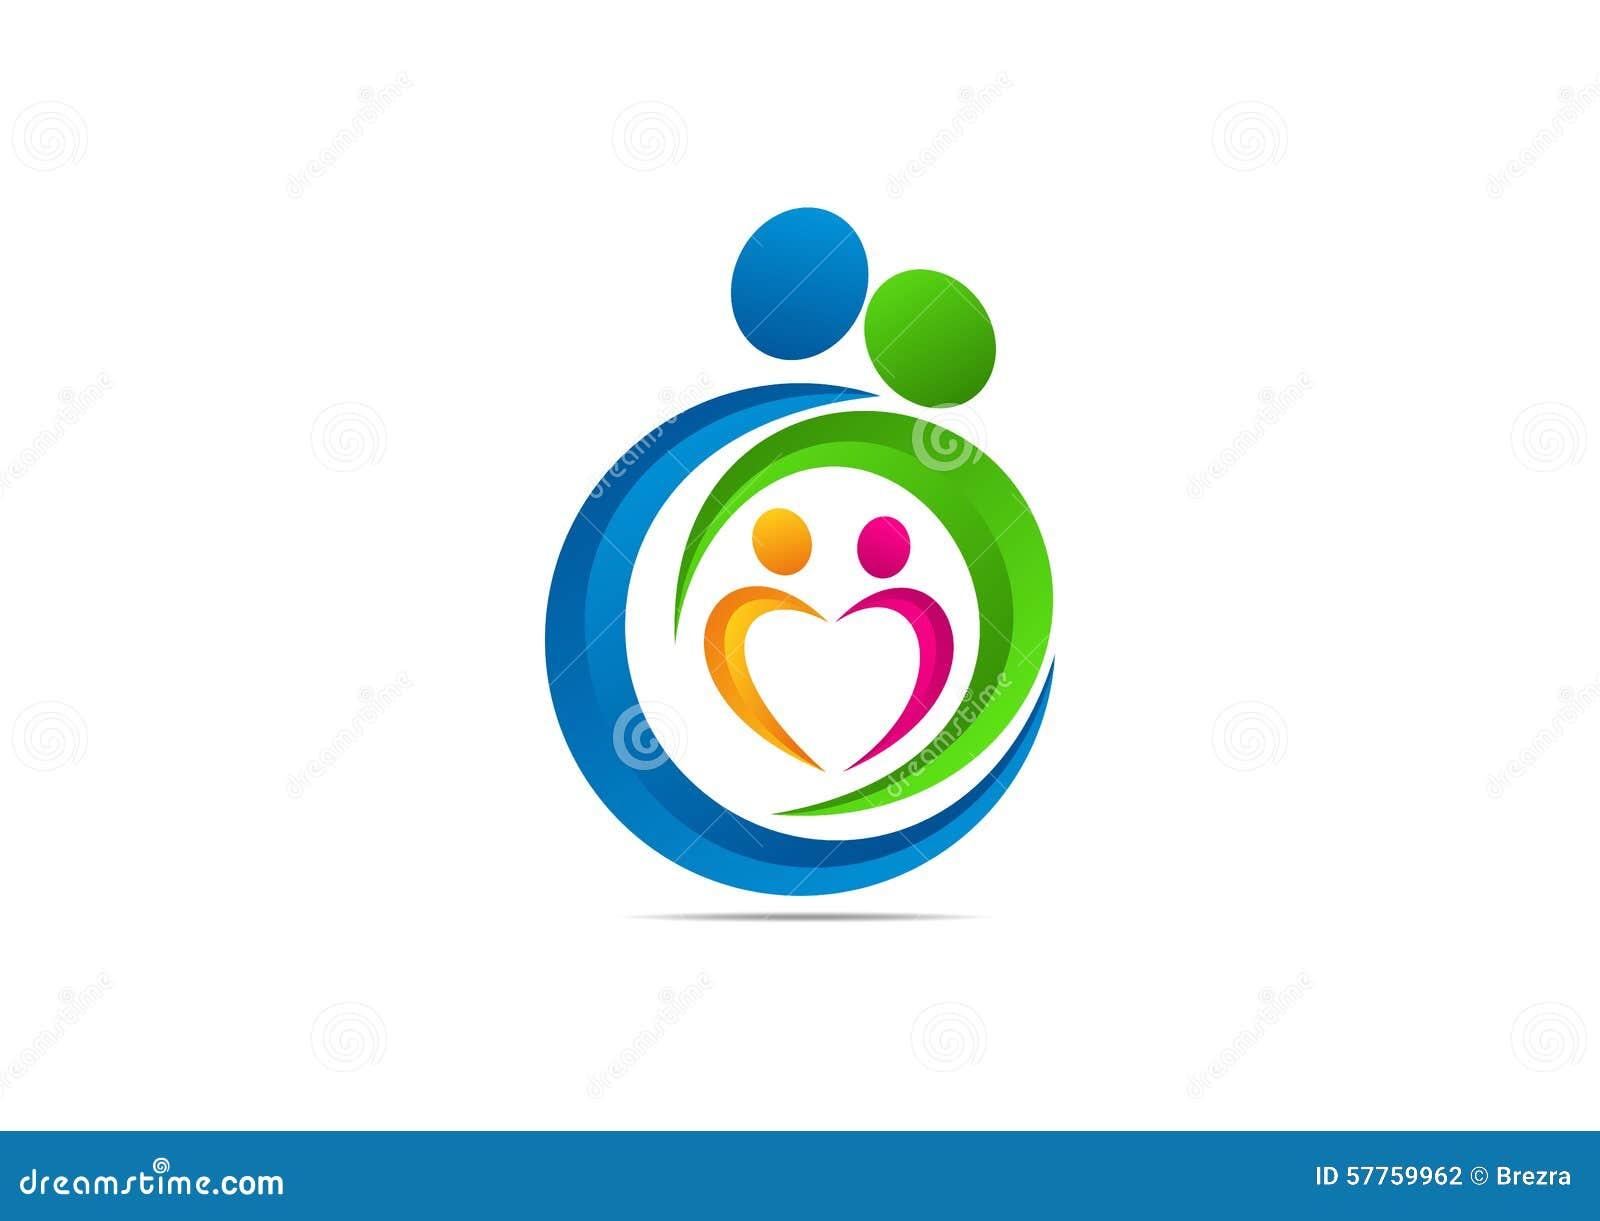 family logo love concept parenting symbol design stock vector